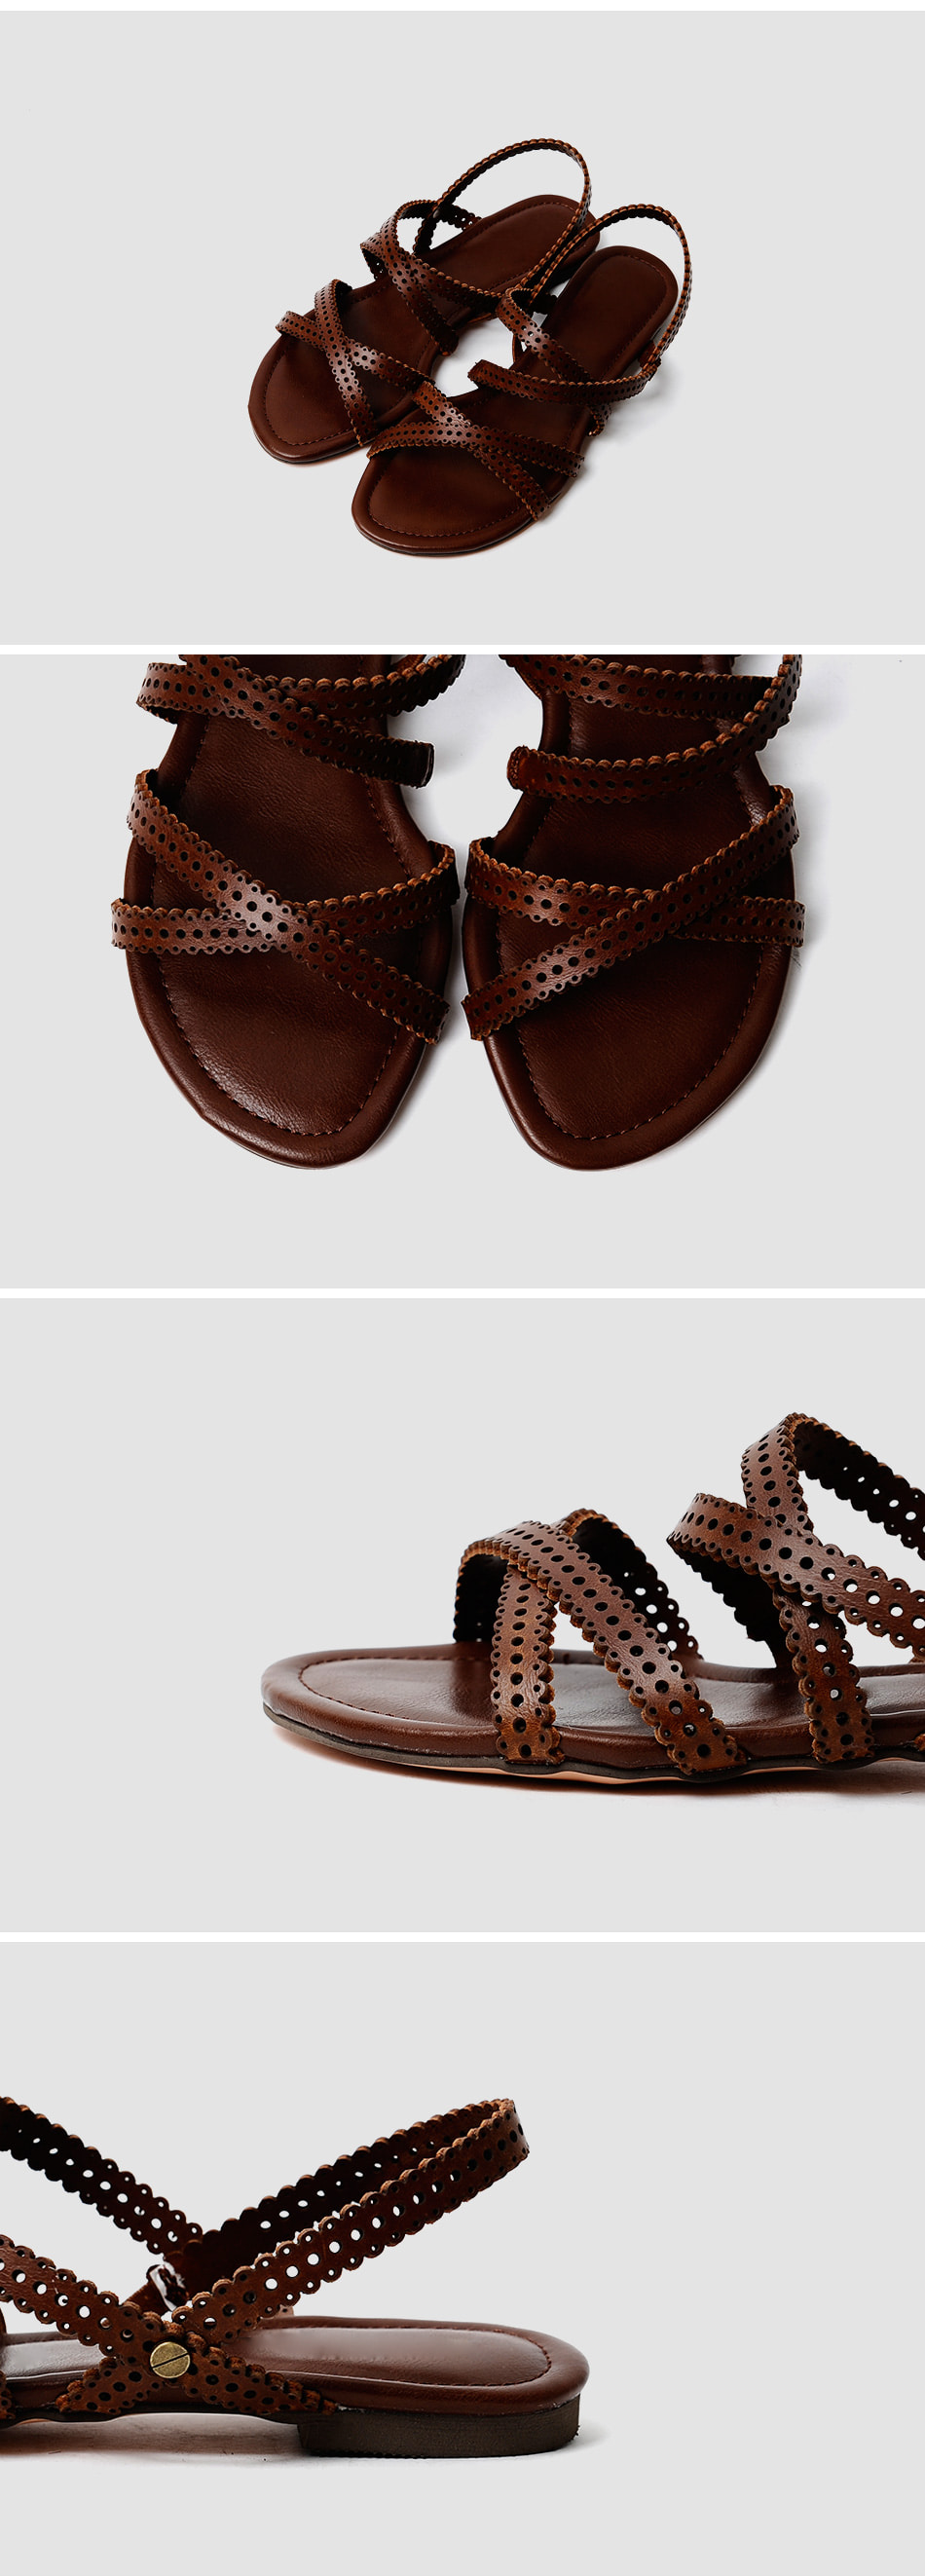 Leoton Slingback Sandals 1cm